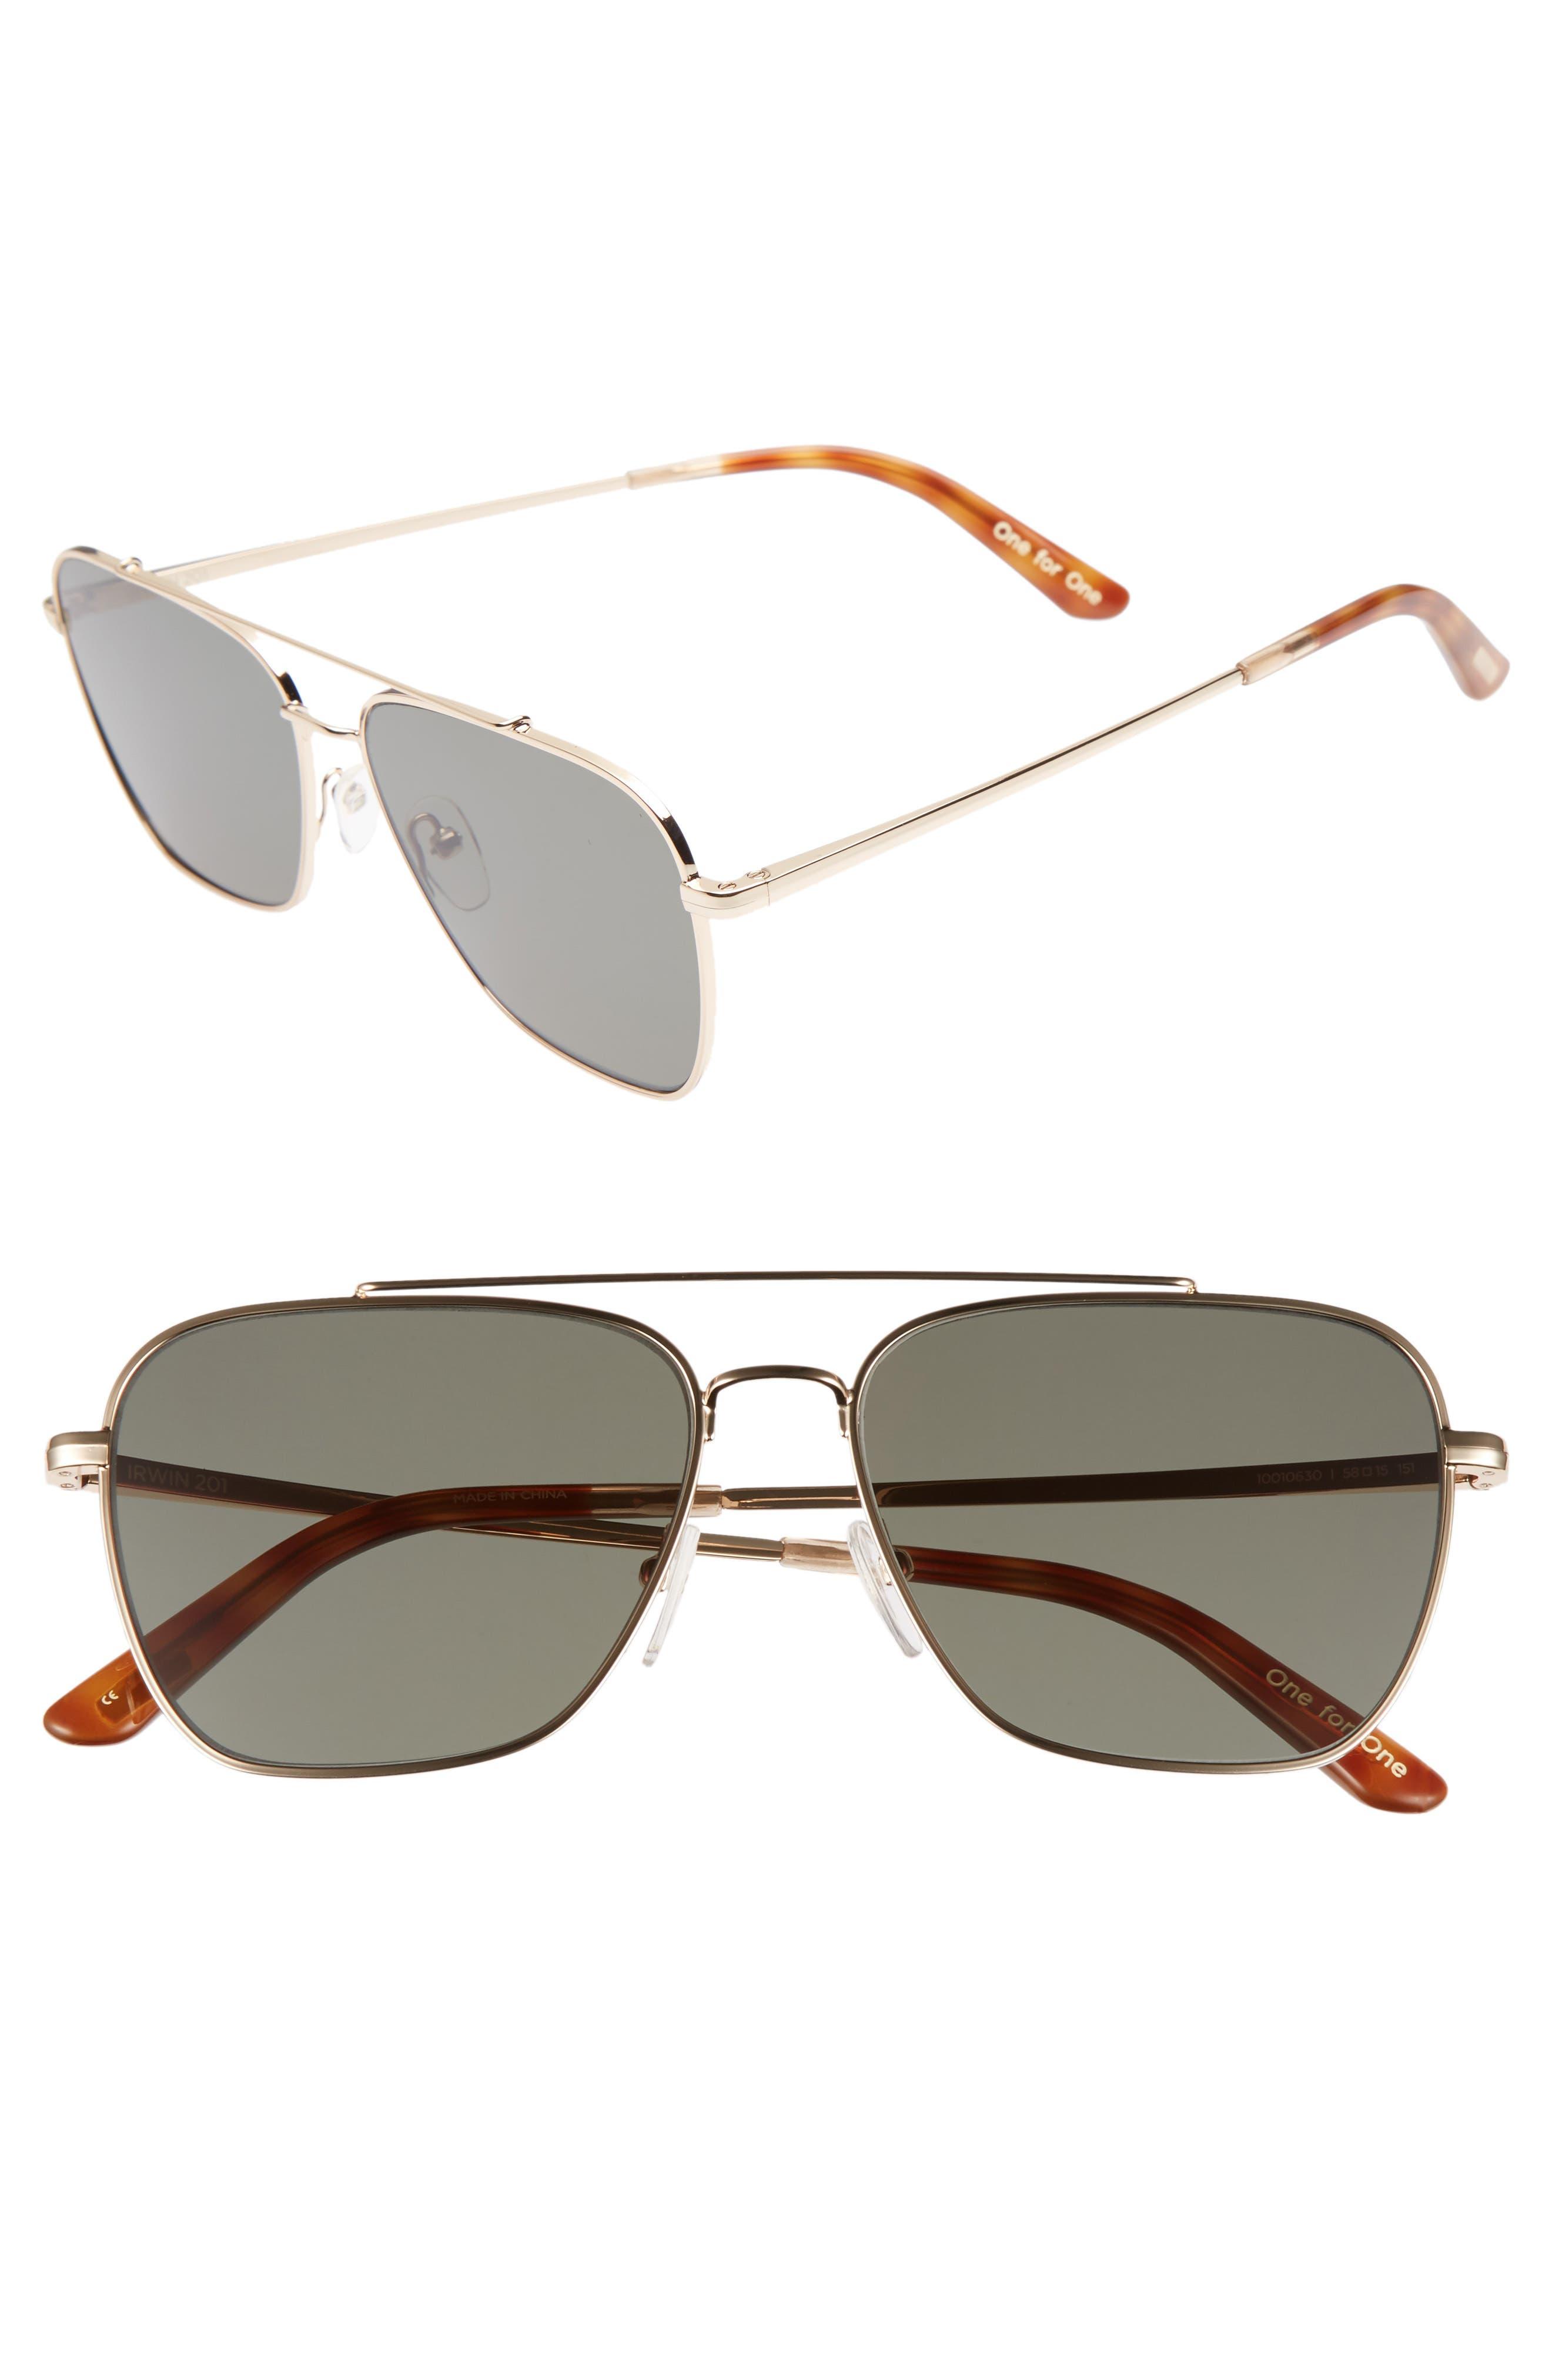 Irwin 58mm Sunglasses,                         Main,                         color, Shiny Gold